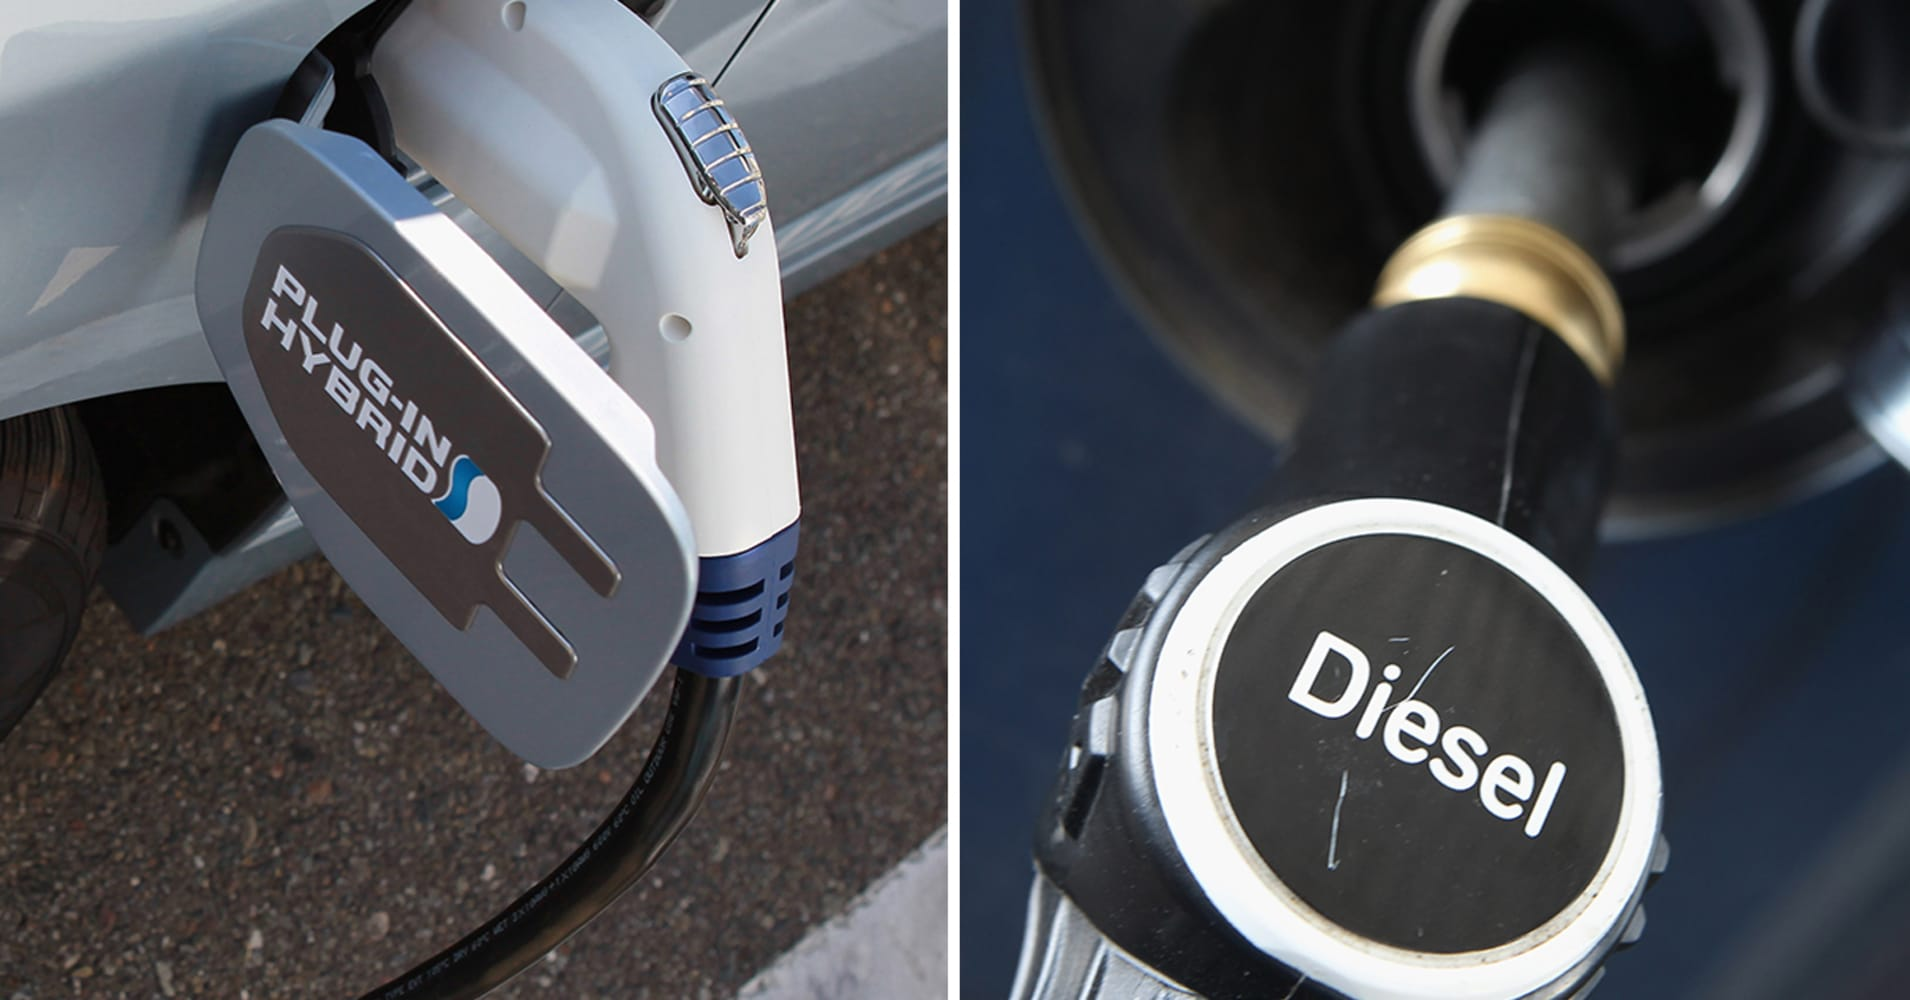 Low-profile Tesla rival begins autonomous-drive road tests in California